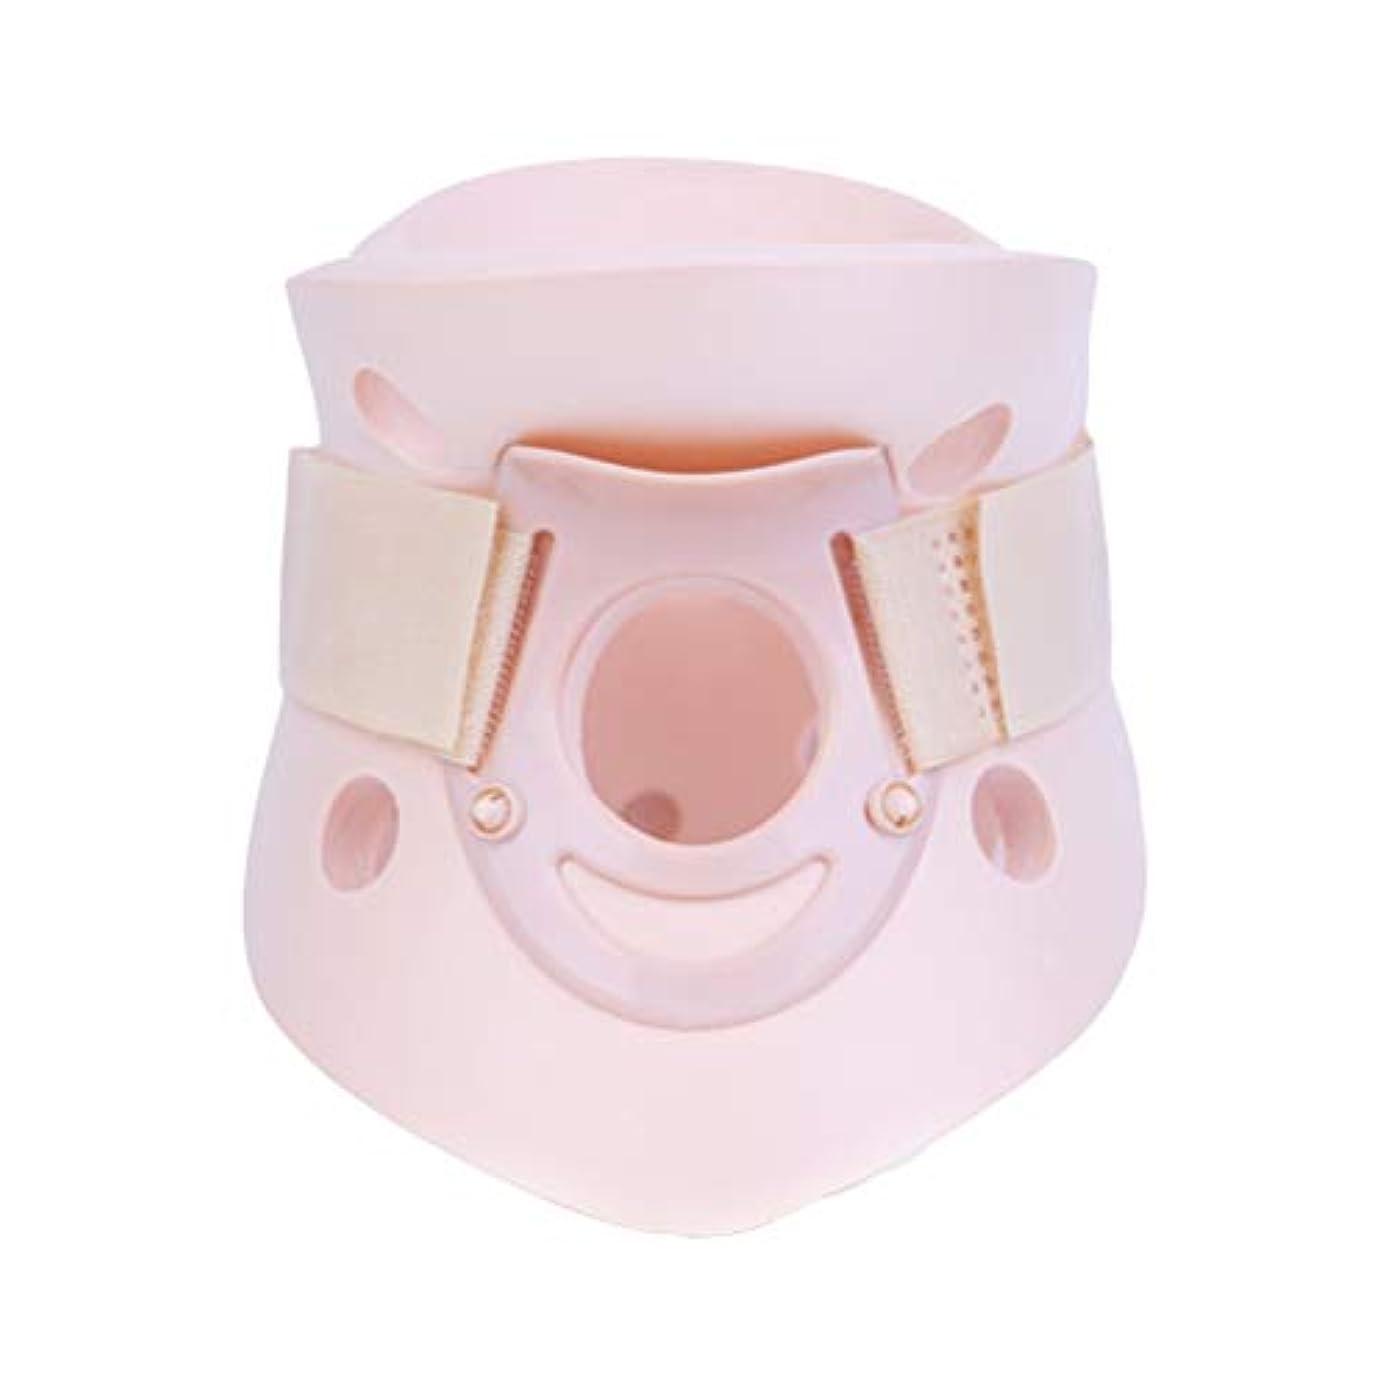 Healifty 頸部頸部牽引装置ホームケア頸部牽引装置サイズm